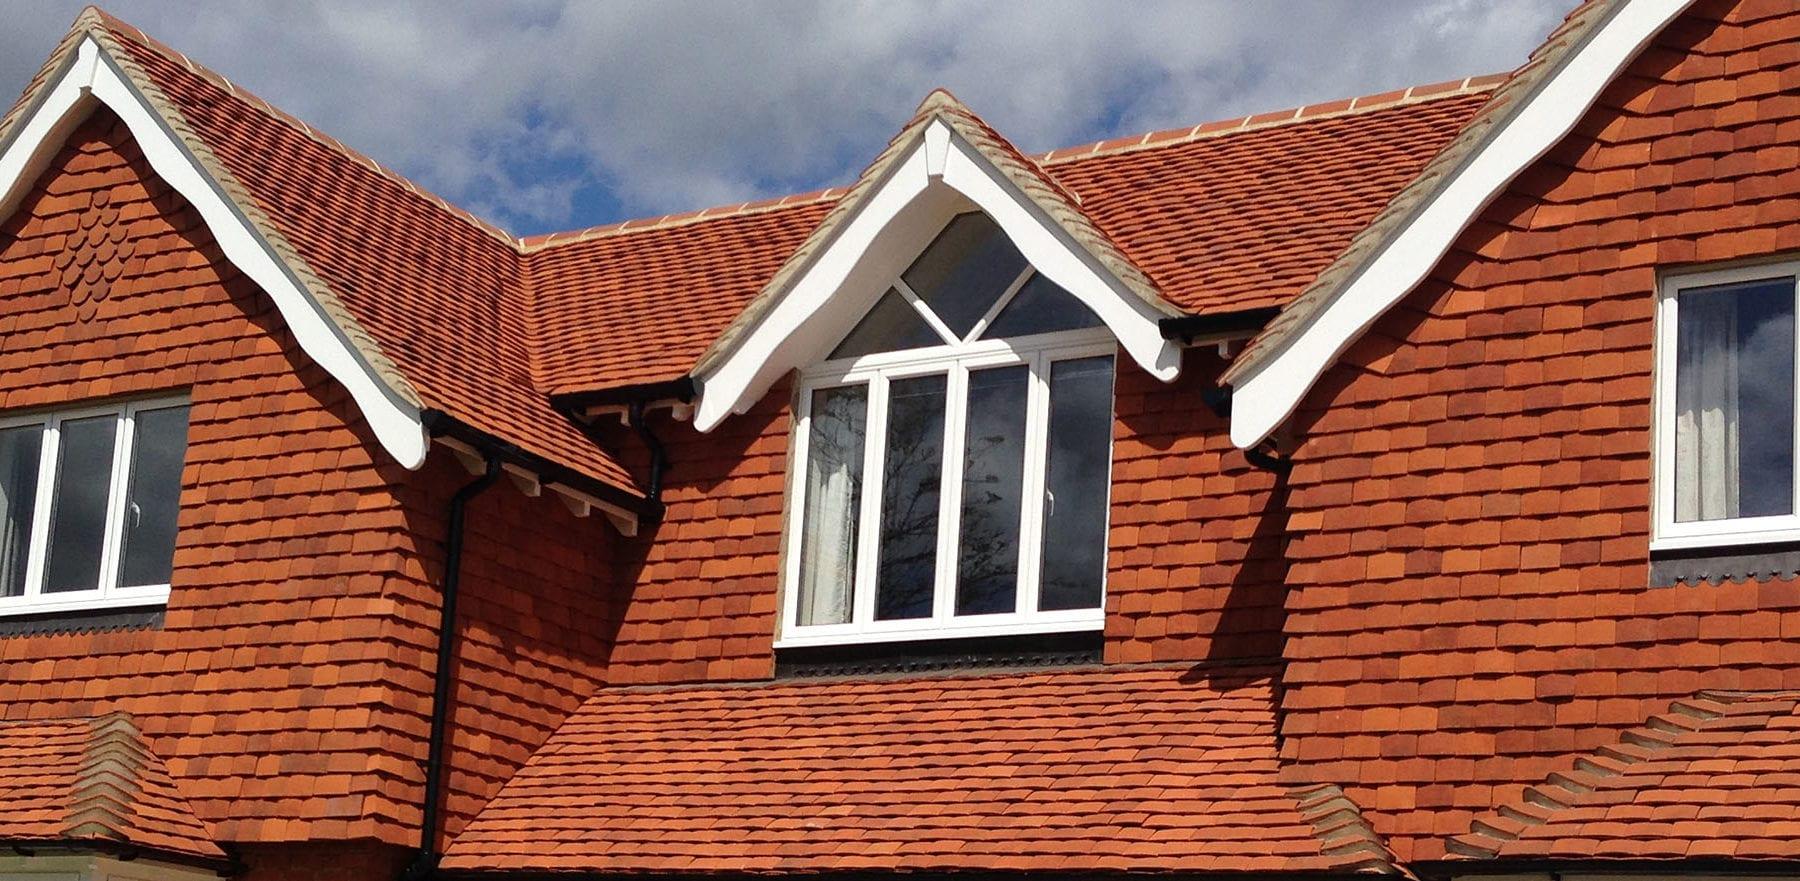 Lifestiles - Handmade Orange Clay Roof Tiles - Bookham, England 3